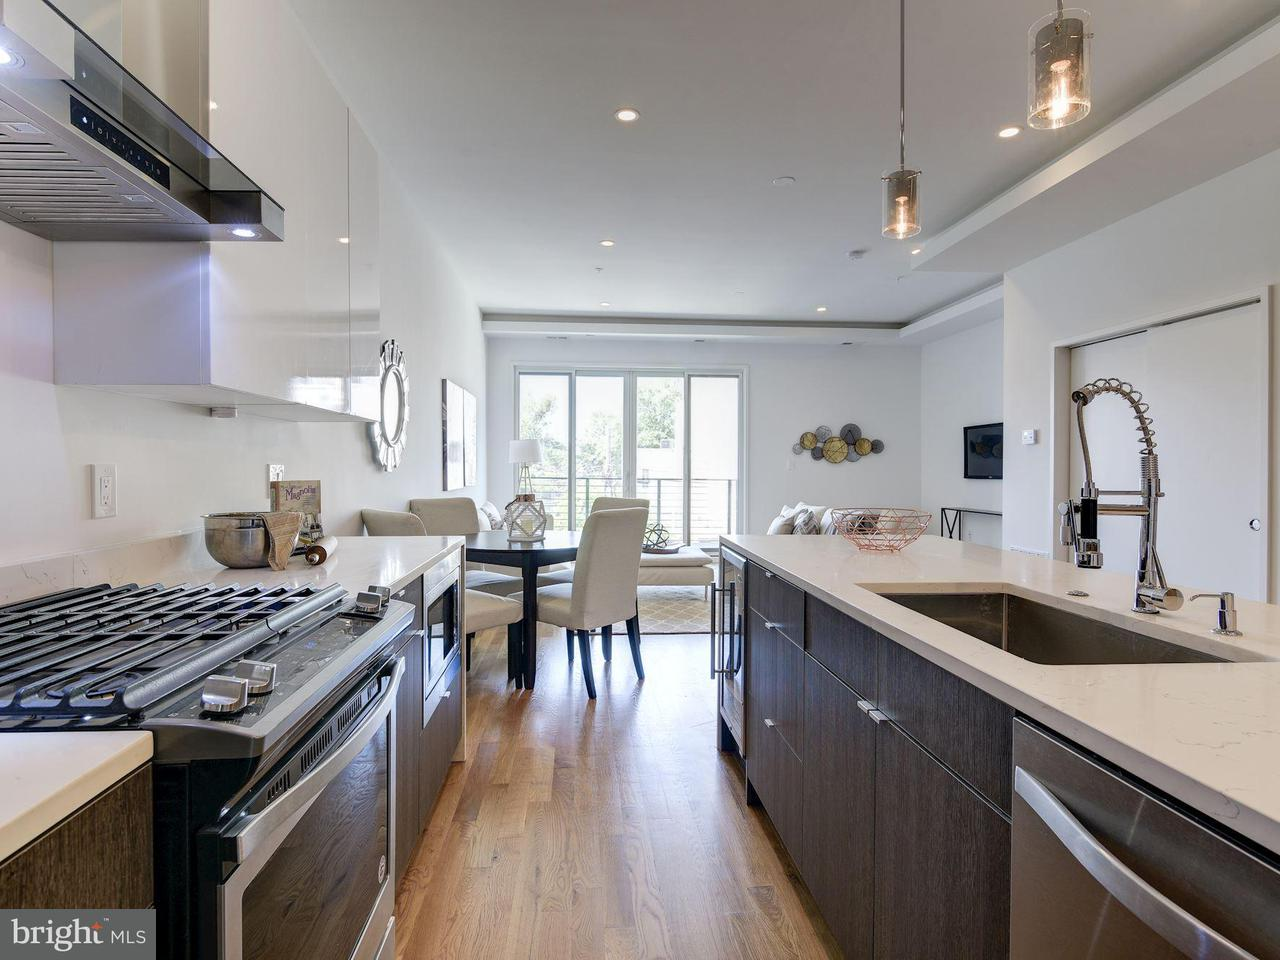 Additional photo for property listing at 1125 MORSE ST NE 1125 MORSE ST NE Washington, Округ Колумбия 20002 Соединенные Штаты